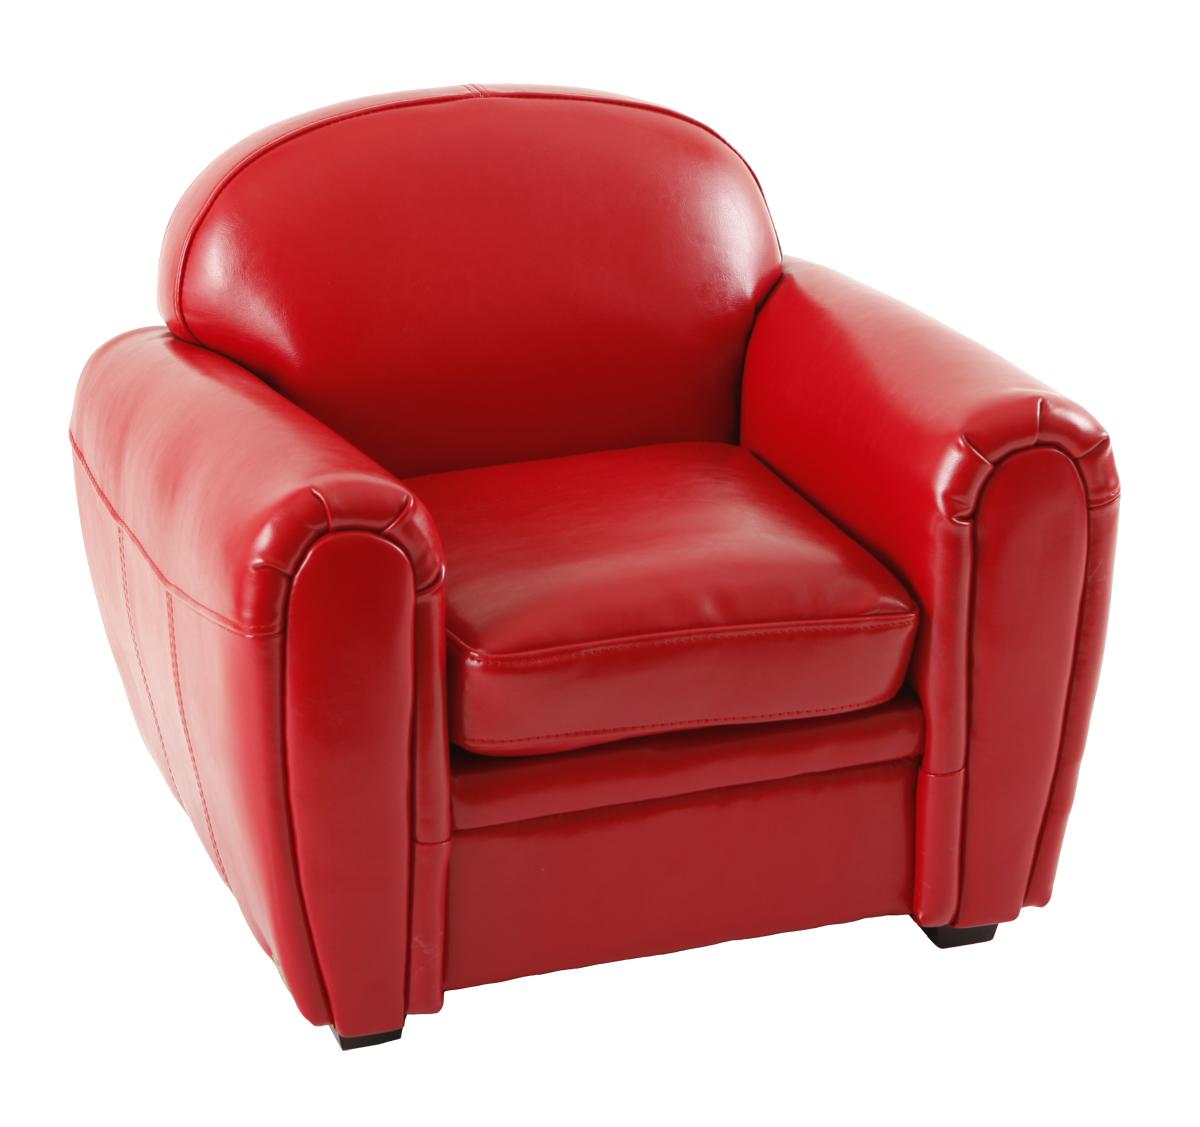 meubles encastr 233 s scholl fauteuil de ultimate shiatsu drma7742e